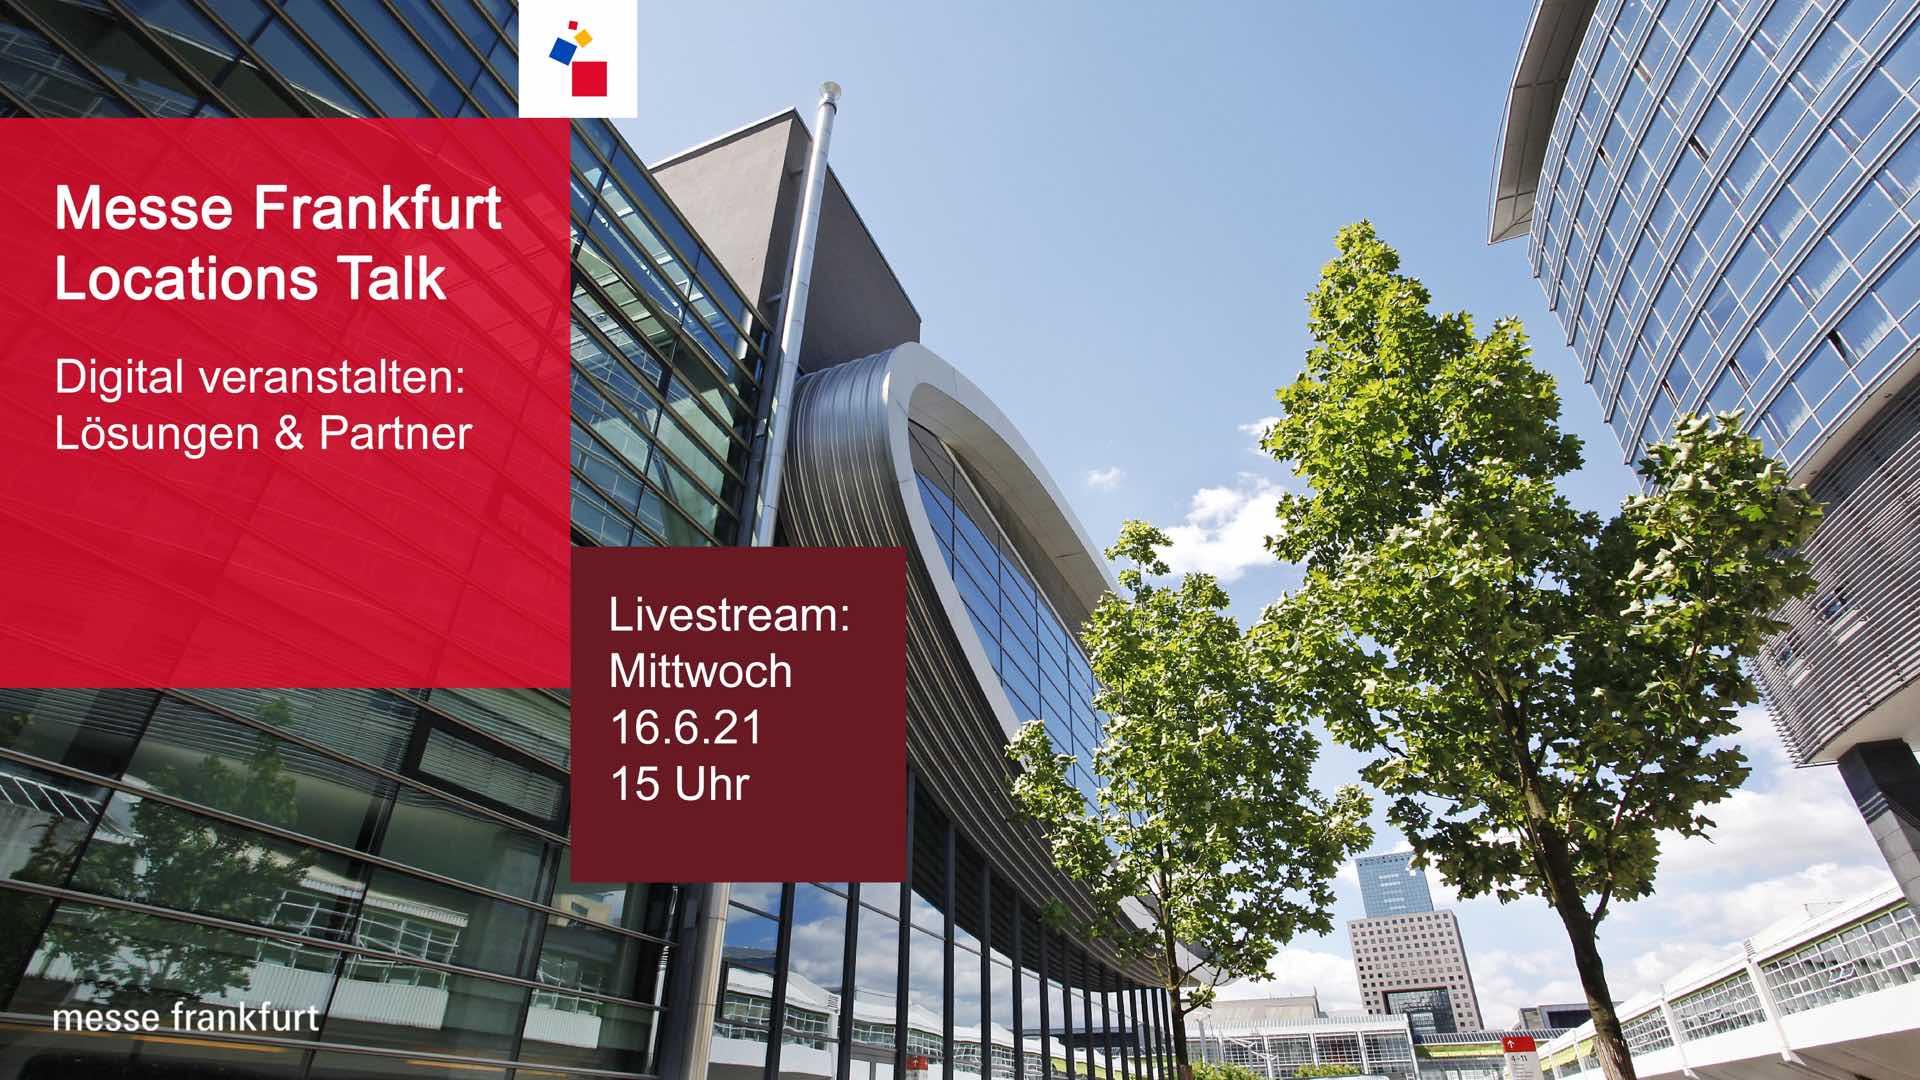 Messe Frankfurt plant Digitalformat für Veranstalter